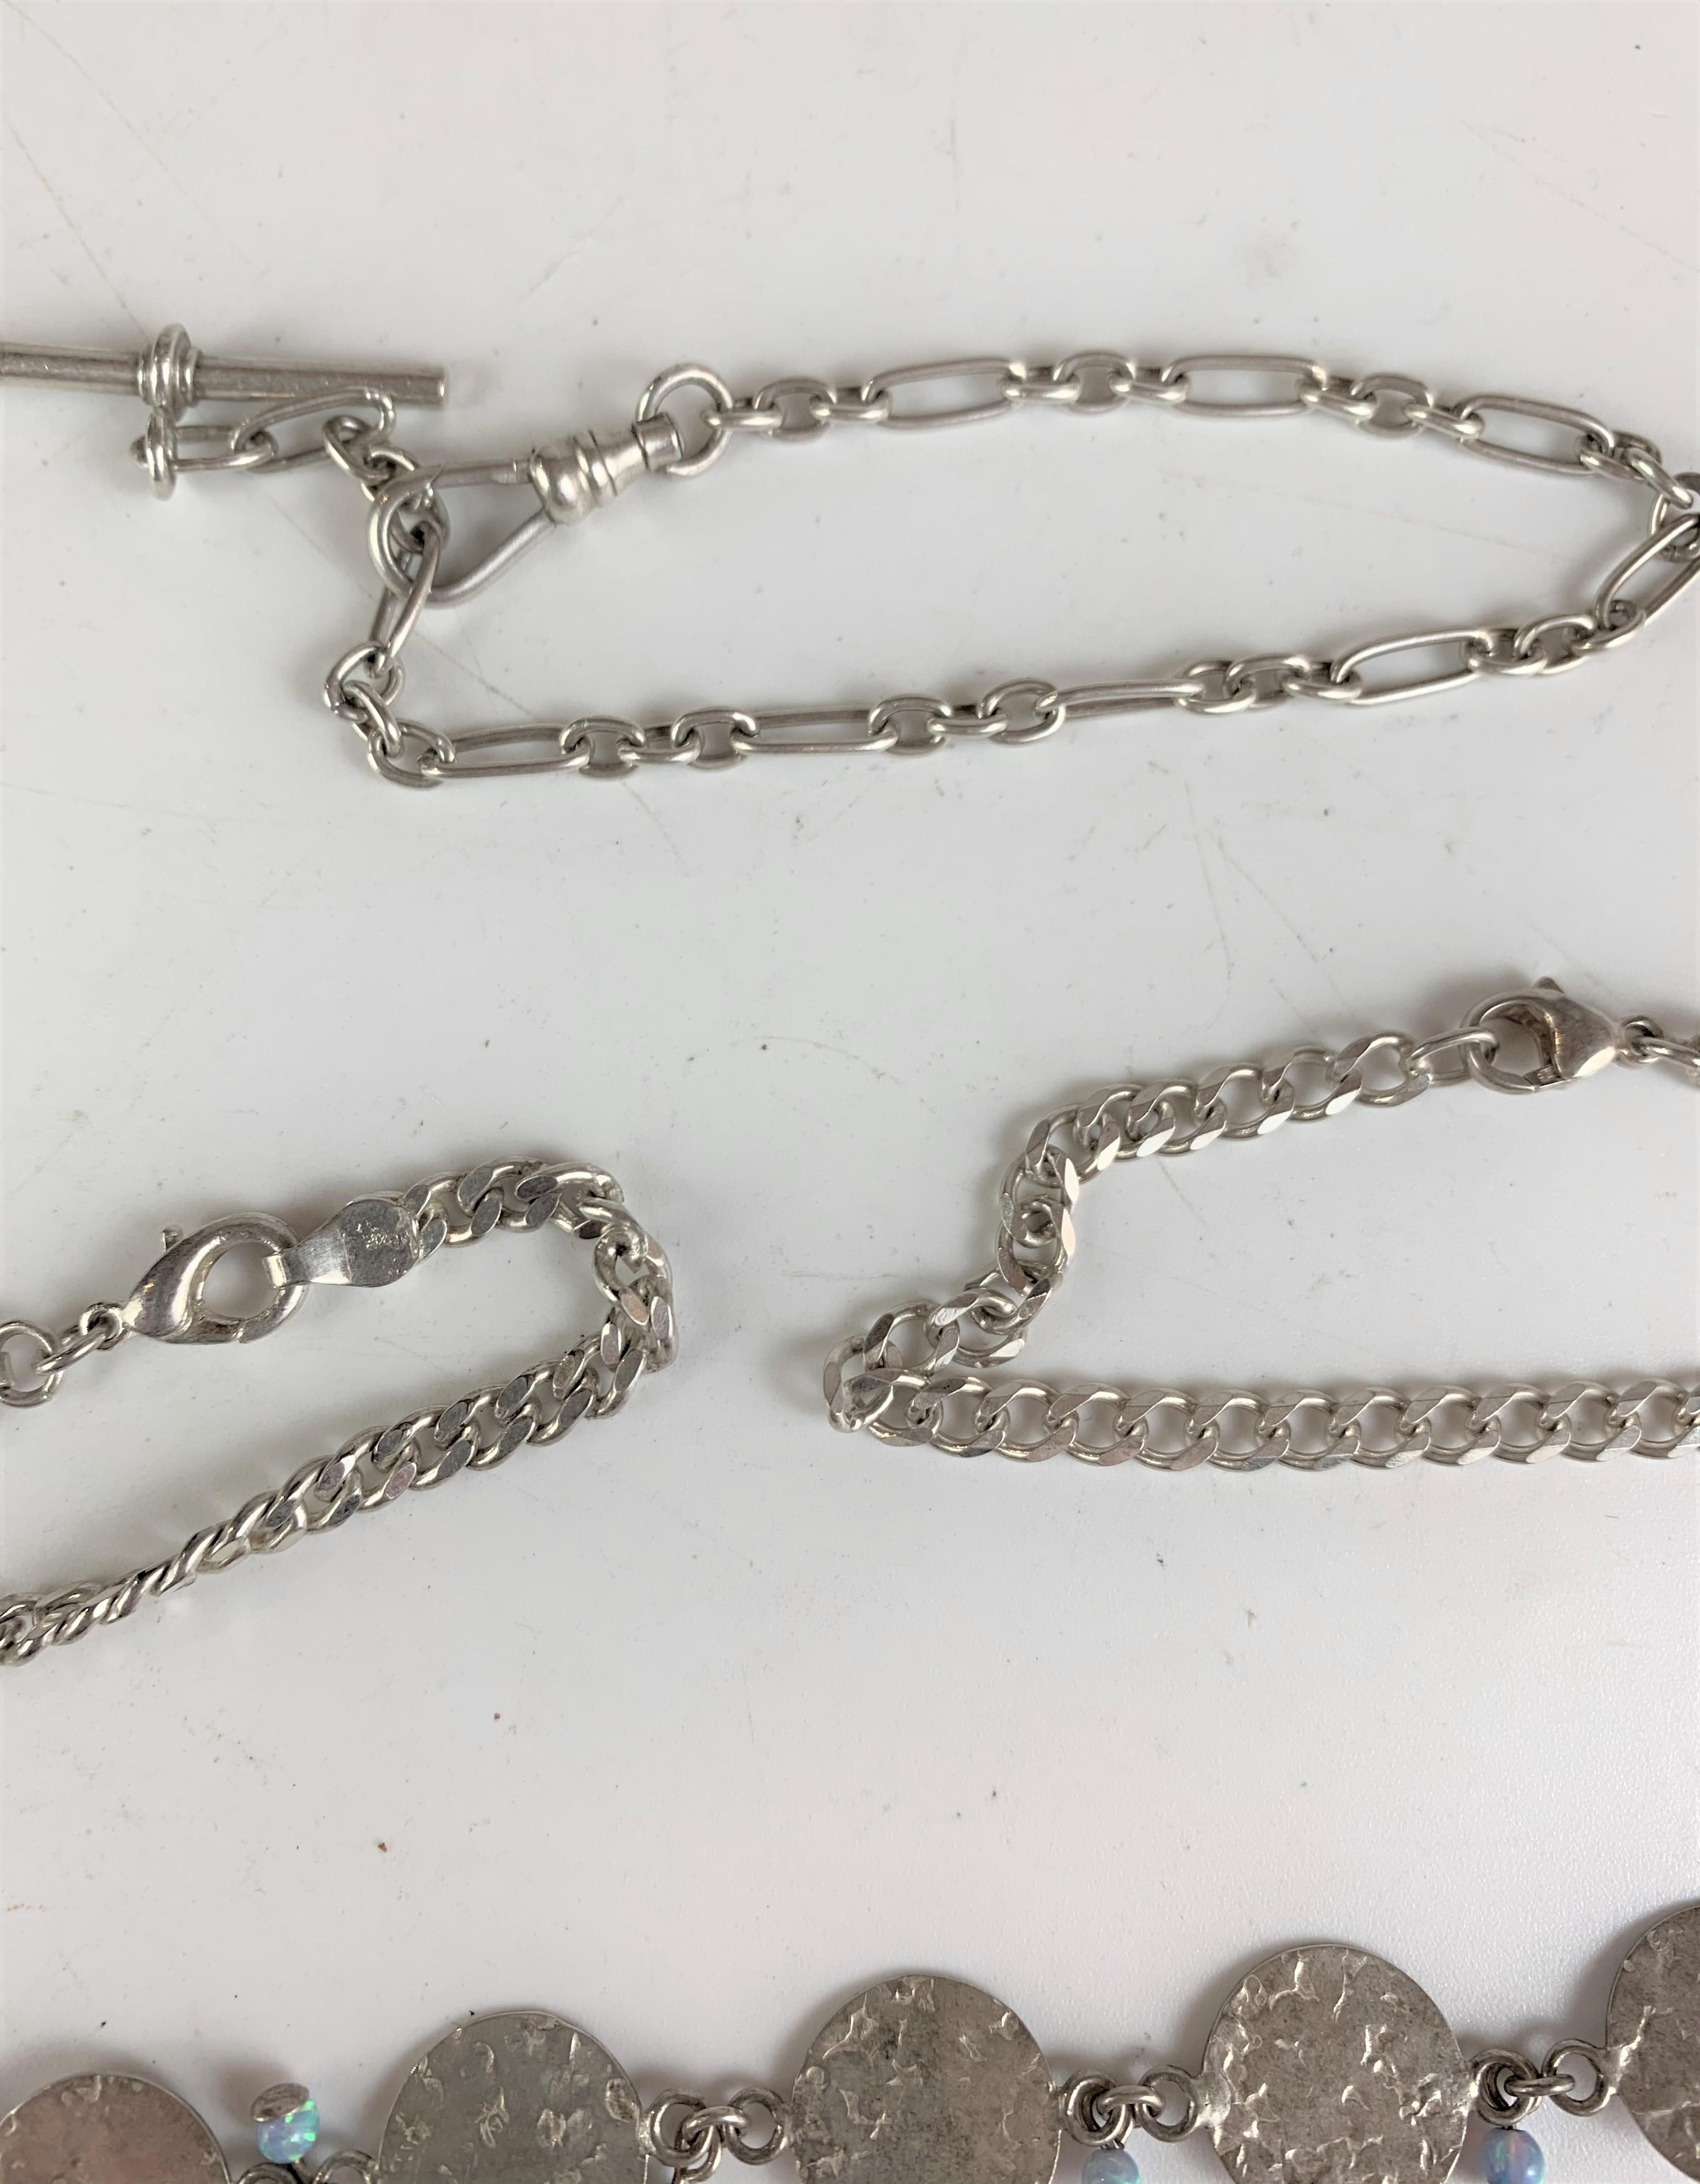 5 silver bracelets, total w: 1.2 ozt - Image 4 of 6